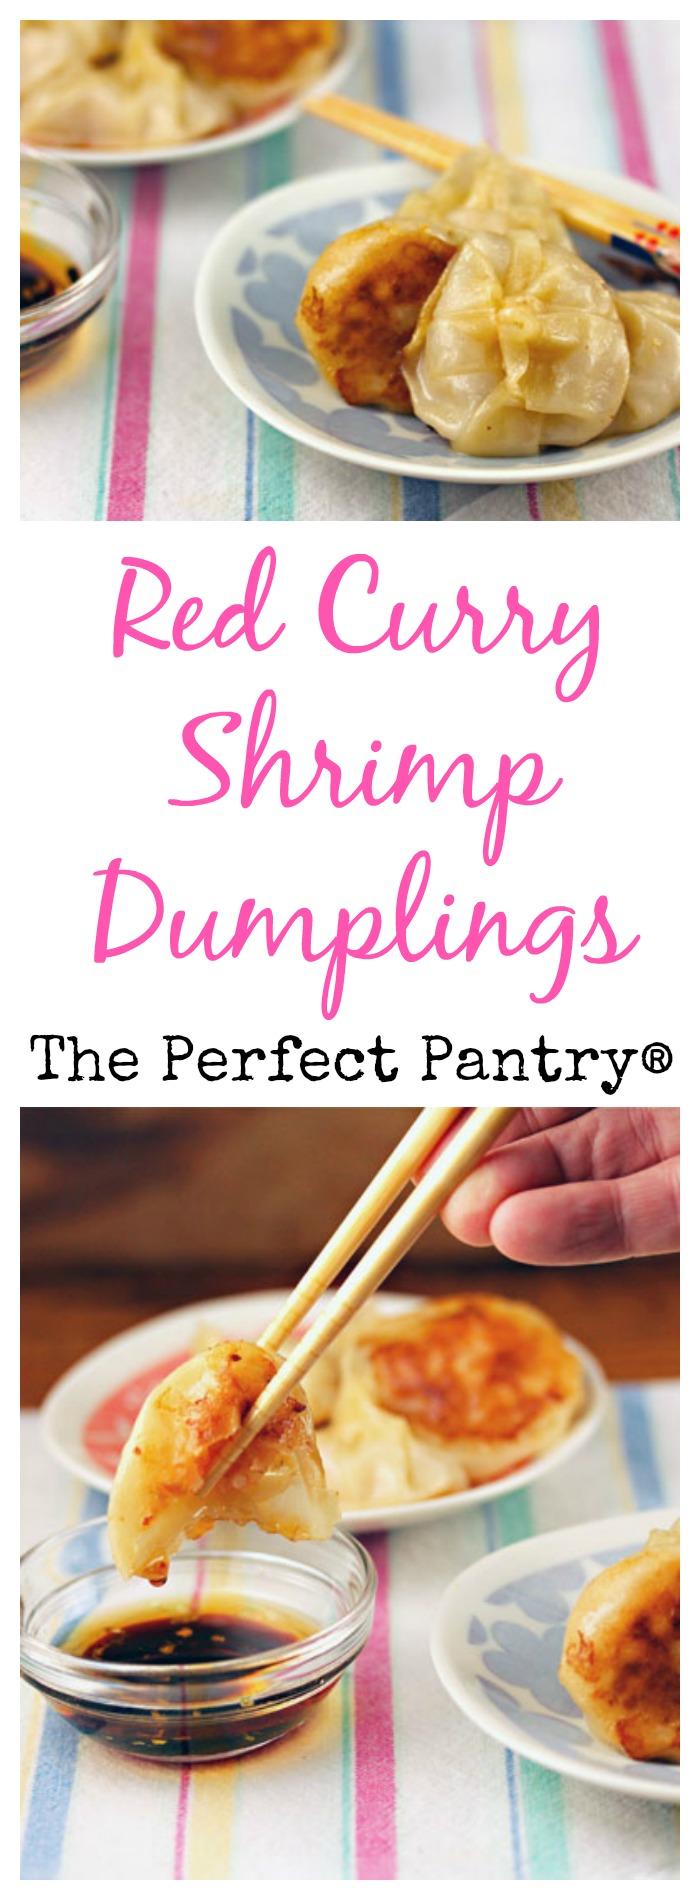 Red curry shrimp dumplings, an appetizer with a kick!